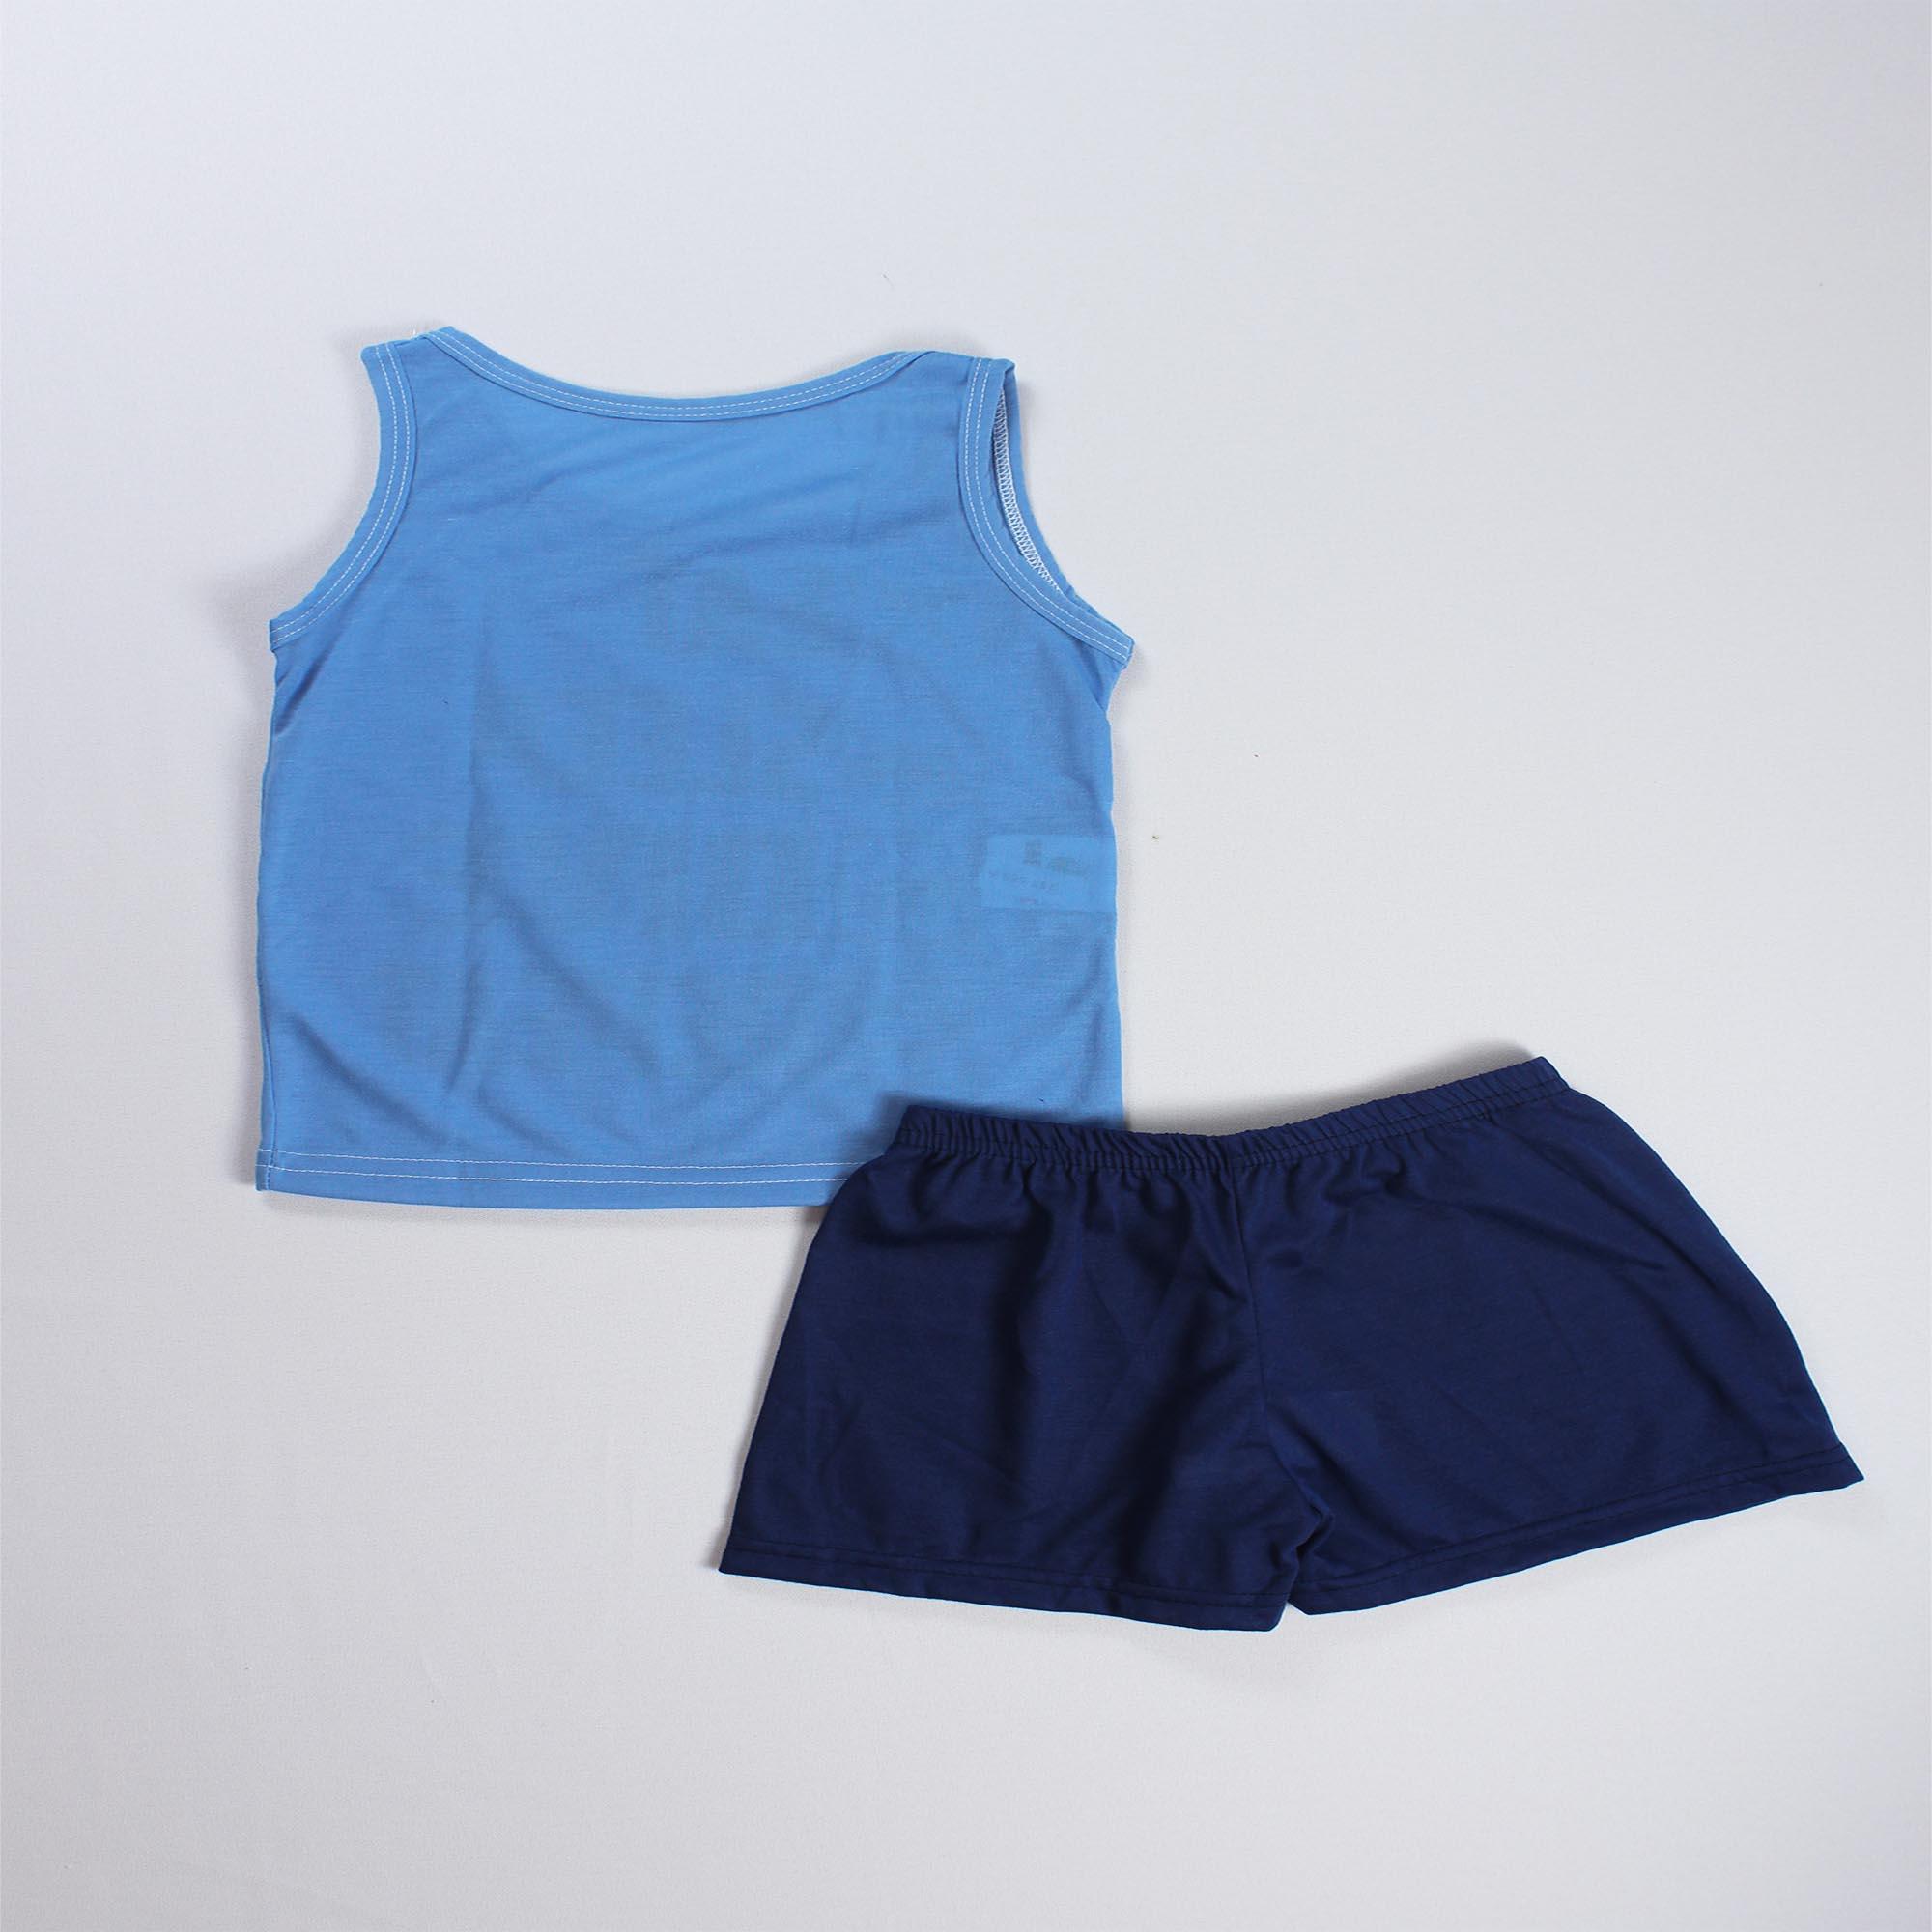 Pijama Regata Infantil Menino - Tamanho 4 ao 8